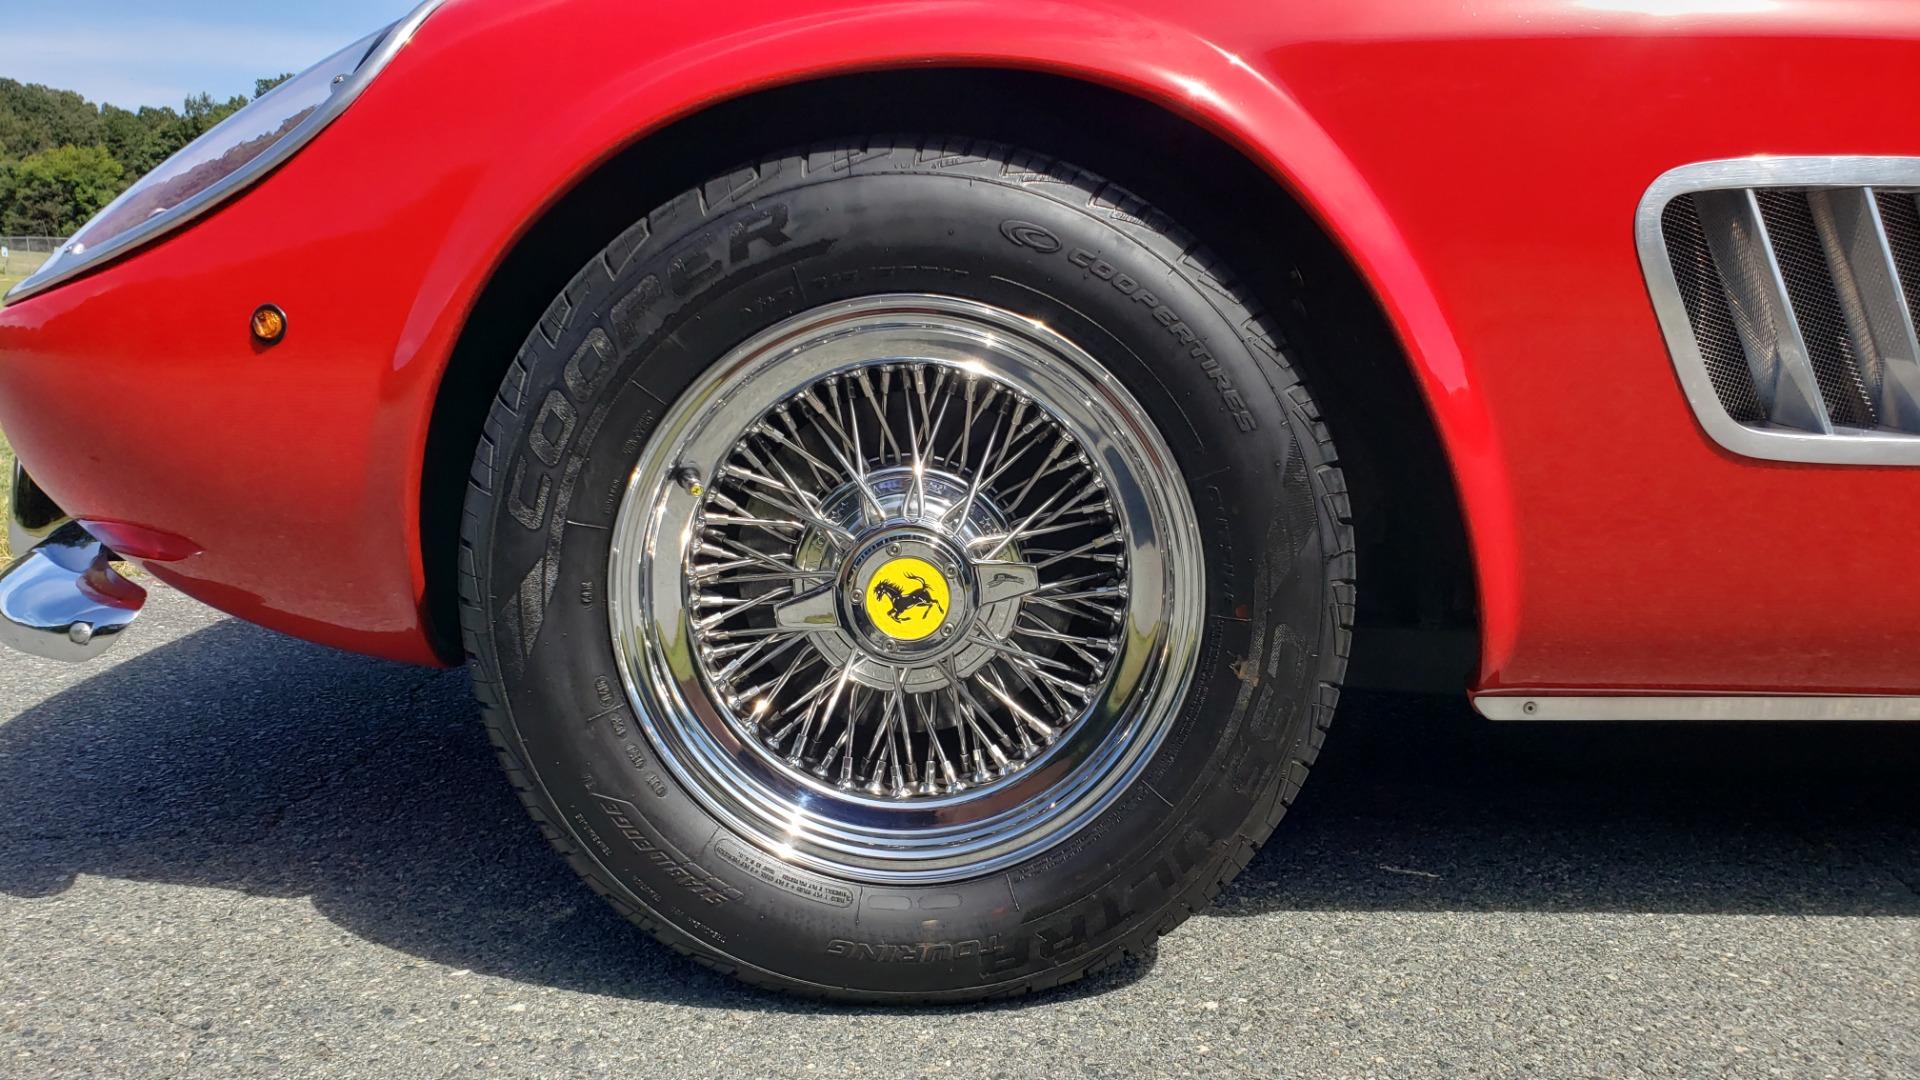 Used 1961 Ferrari 250GT SWB CALIFORNIA REPLICA / 302CI V8 / TREMEC 5-SPEED for sale Sold at Formula Imports in Charlotte NC 28227 56